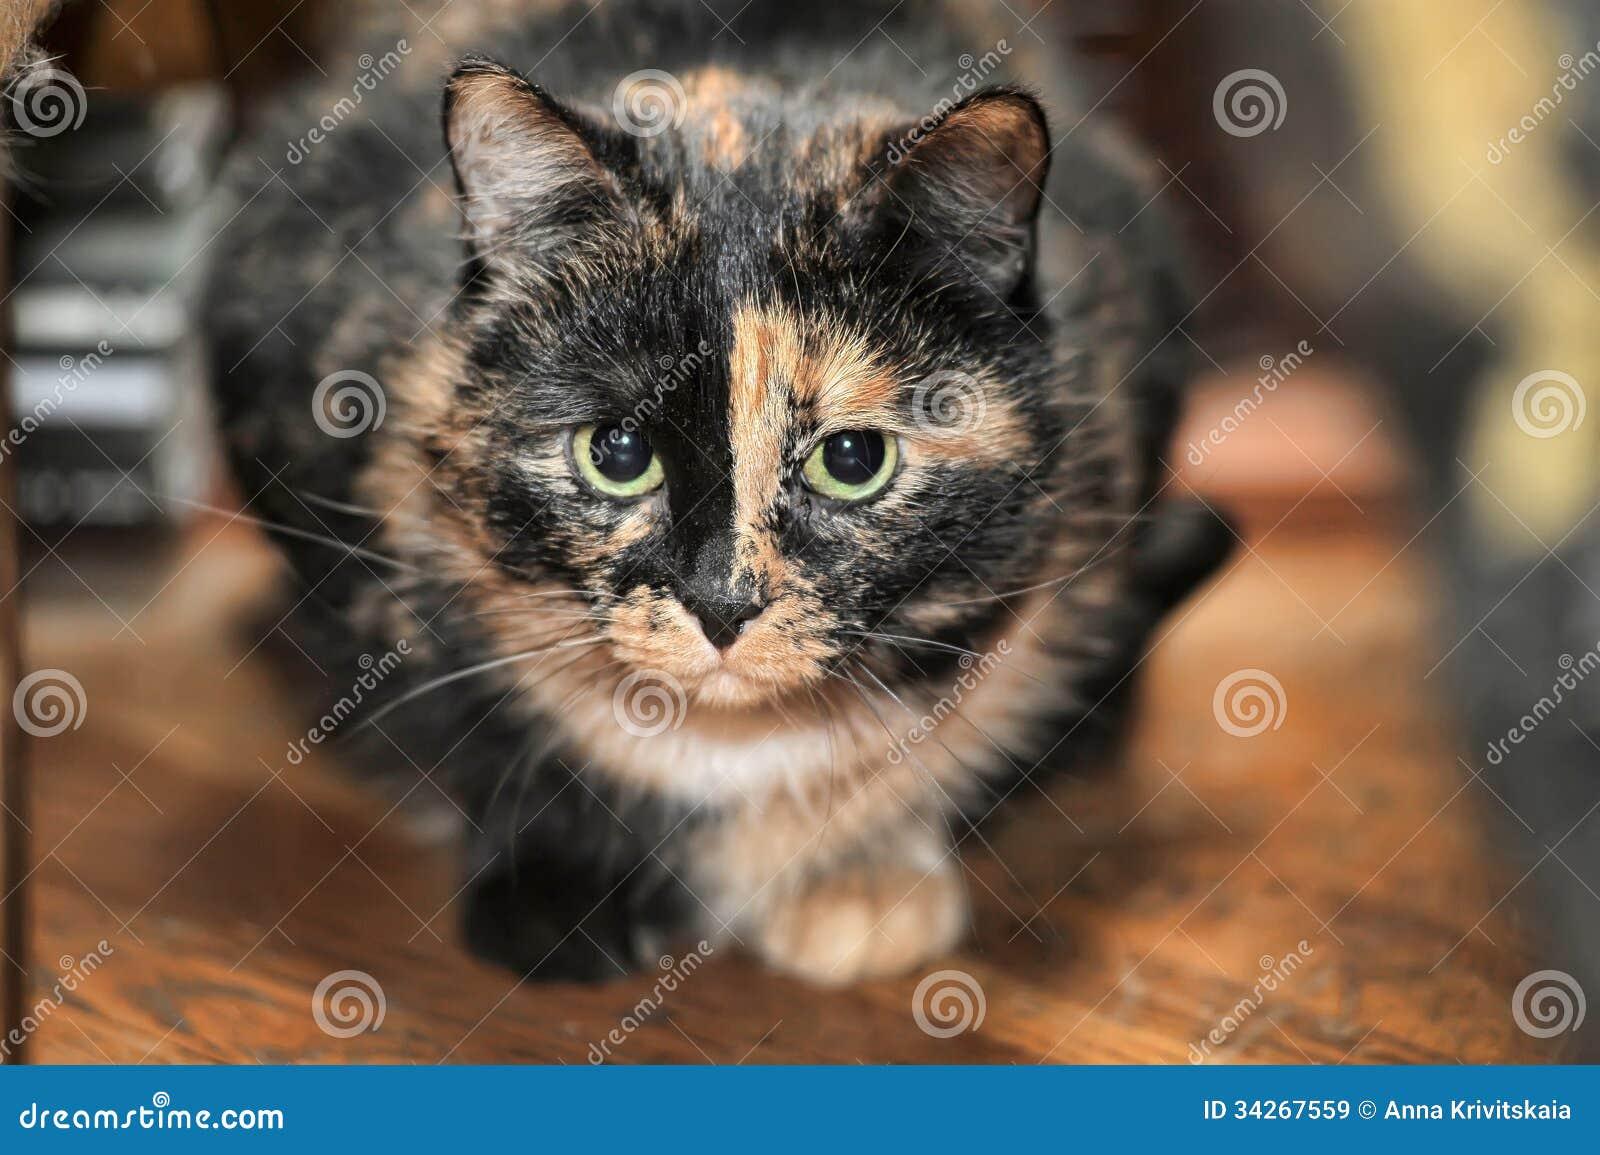 Tortoiseshell cat sits